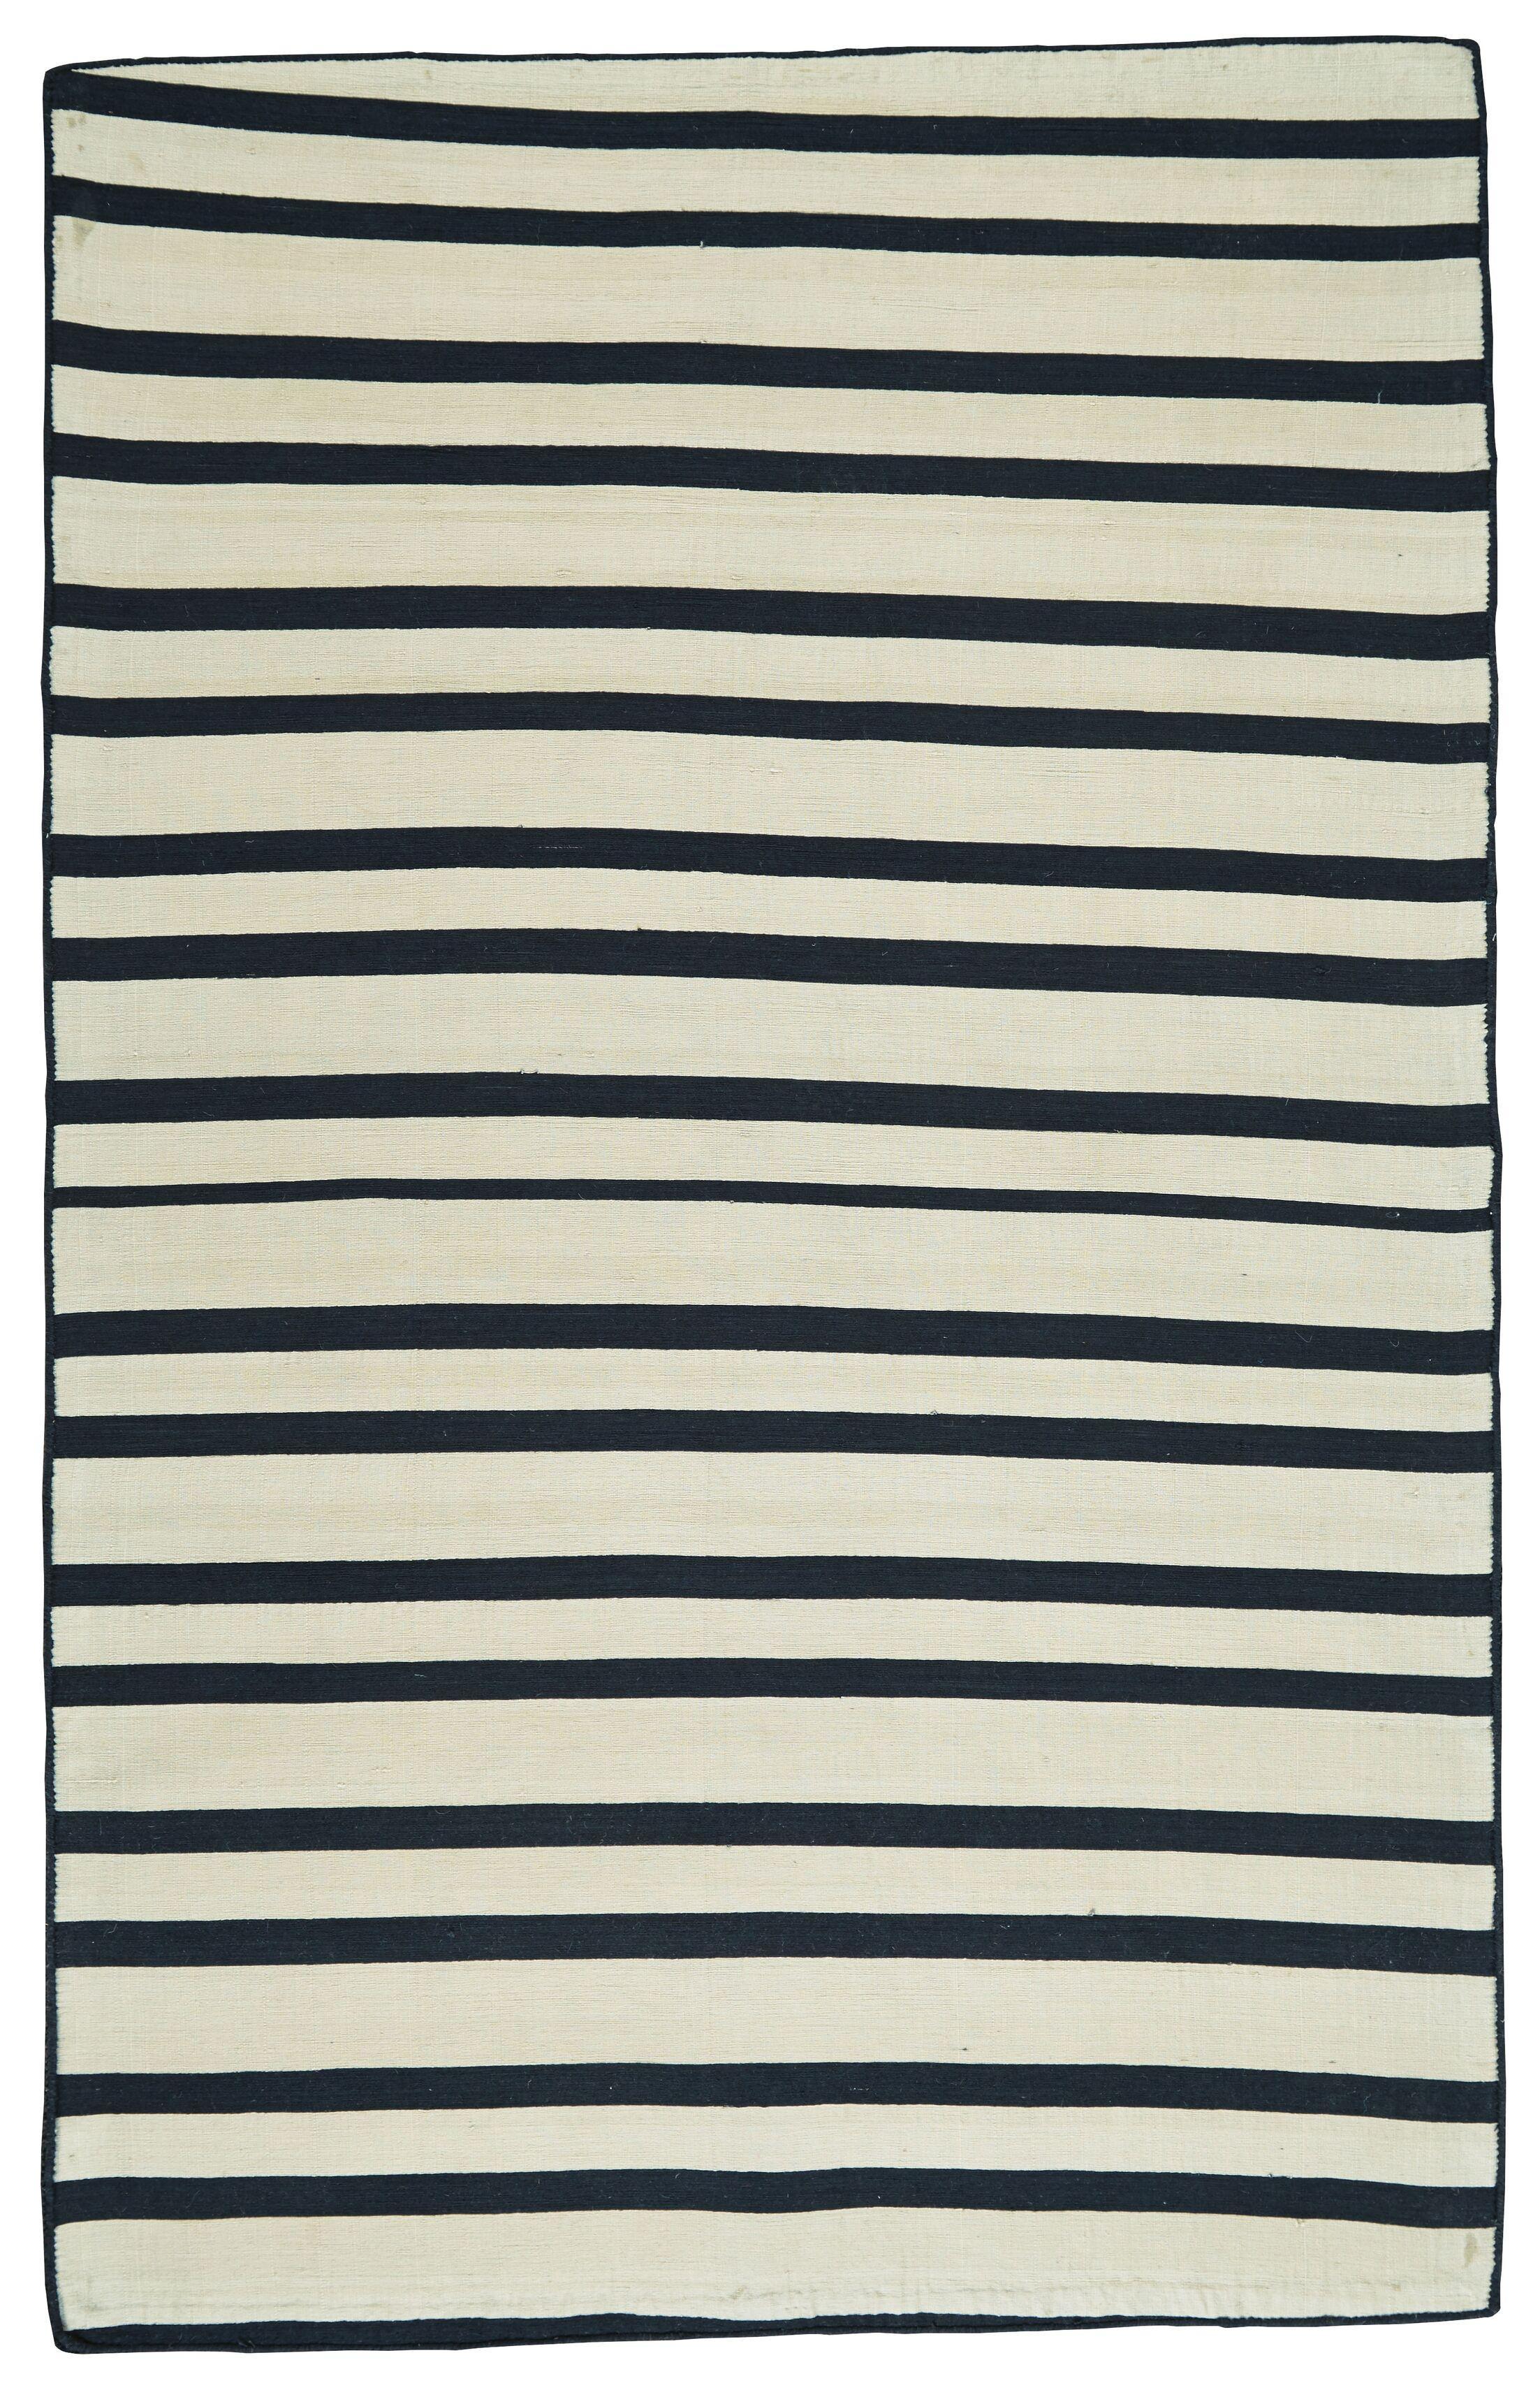 Jolie Hand Loomed Midnight Indoor/Outdoor Area Rug Rug Size: Rectangle 8' x 11'